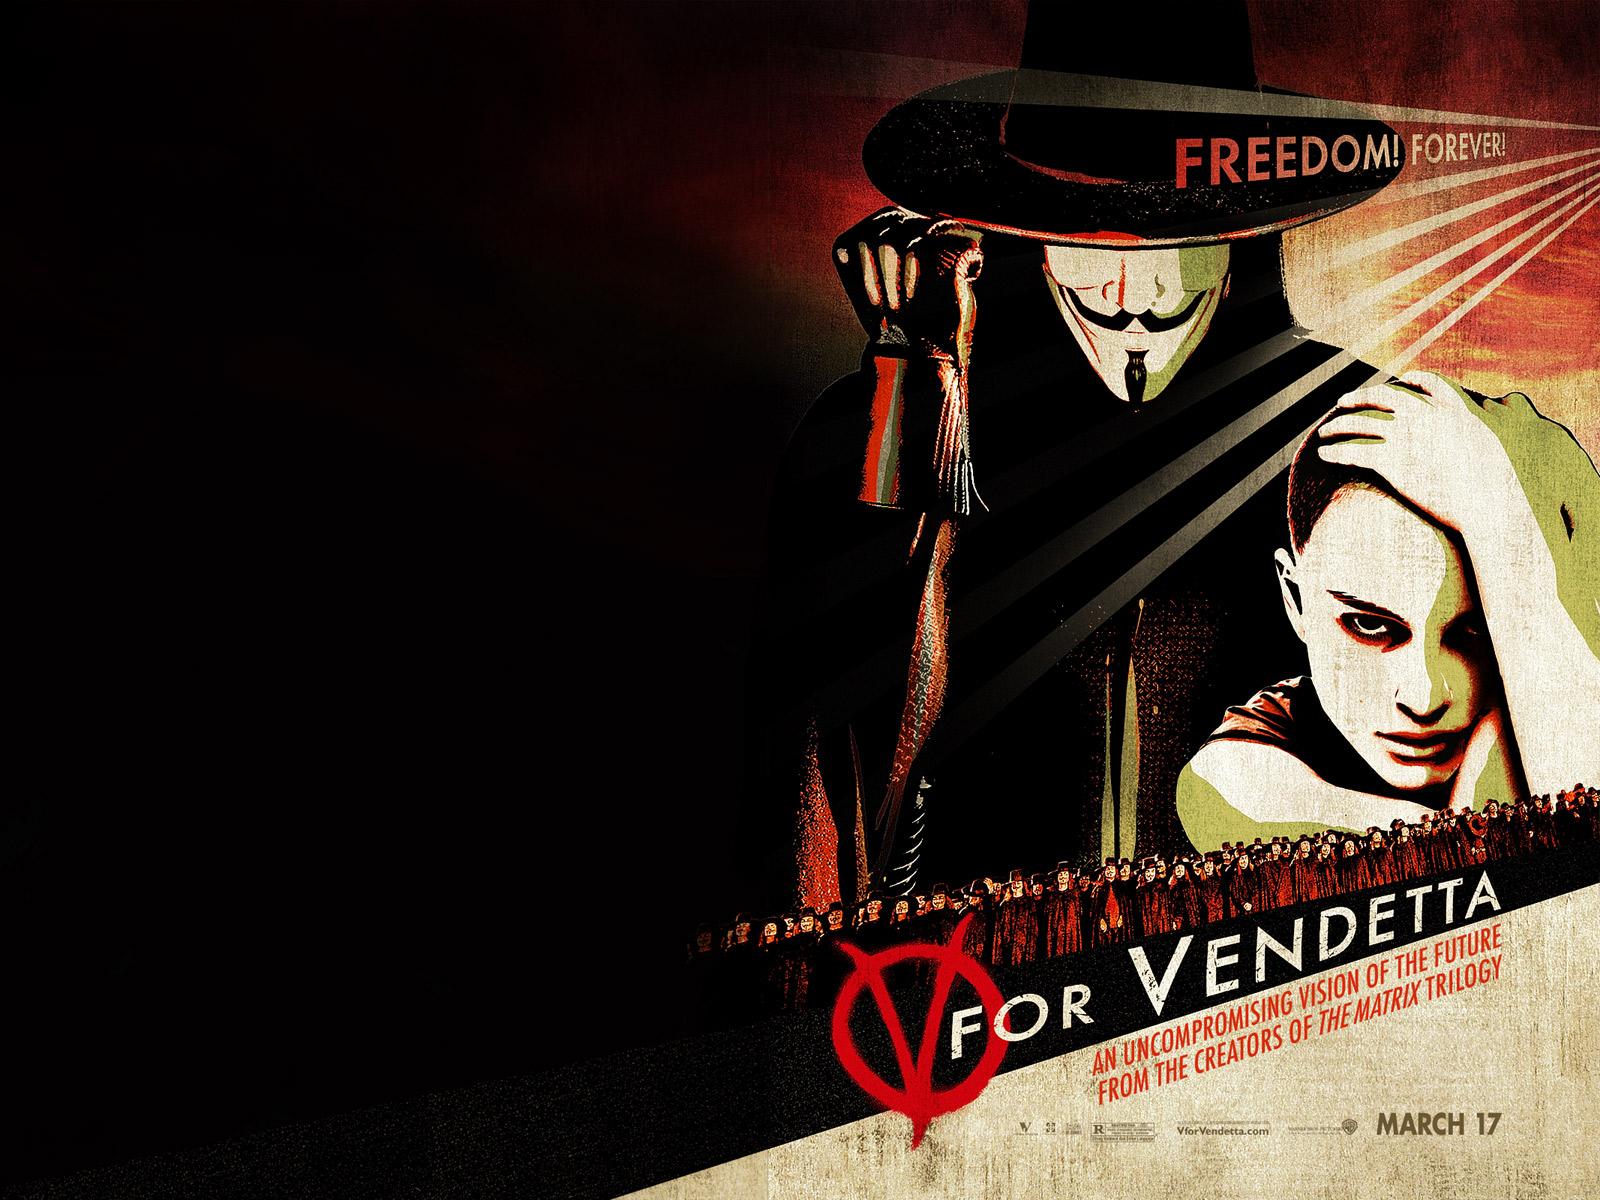 http://2.bp.blogspot.com/-Ir78qLsfI-s/TrWsVMiAlWI/AAAAAAAABGk/5WINEsSHDvM/s1600/Natalie_Portman_in_V_for_Vendetta_Wallpaper_4_1280.jpg